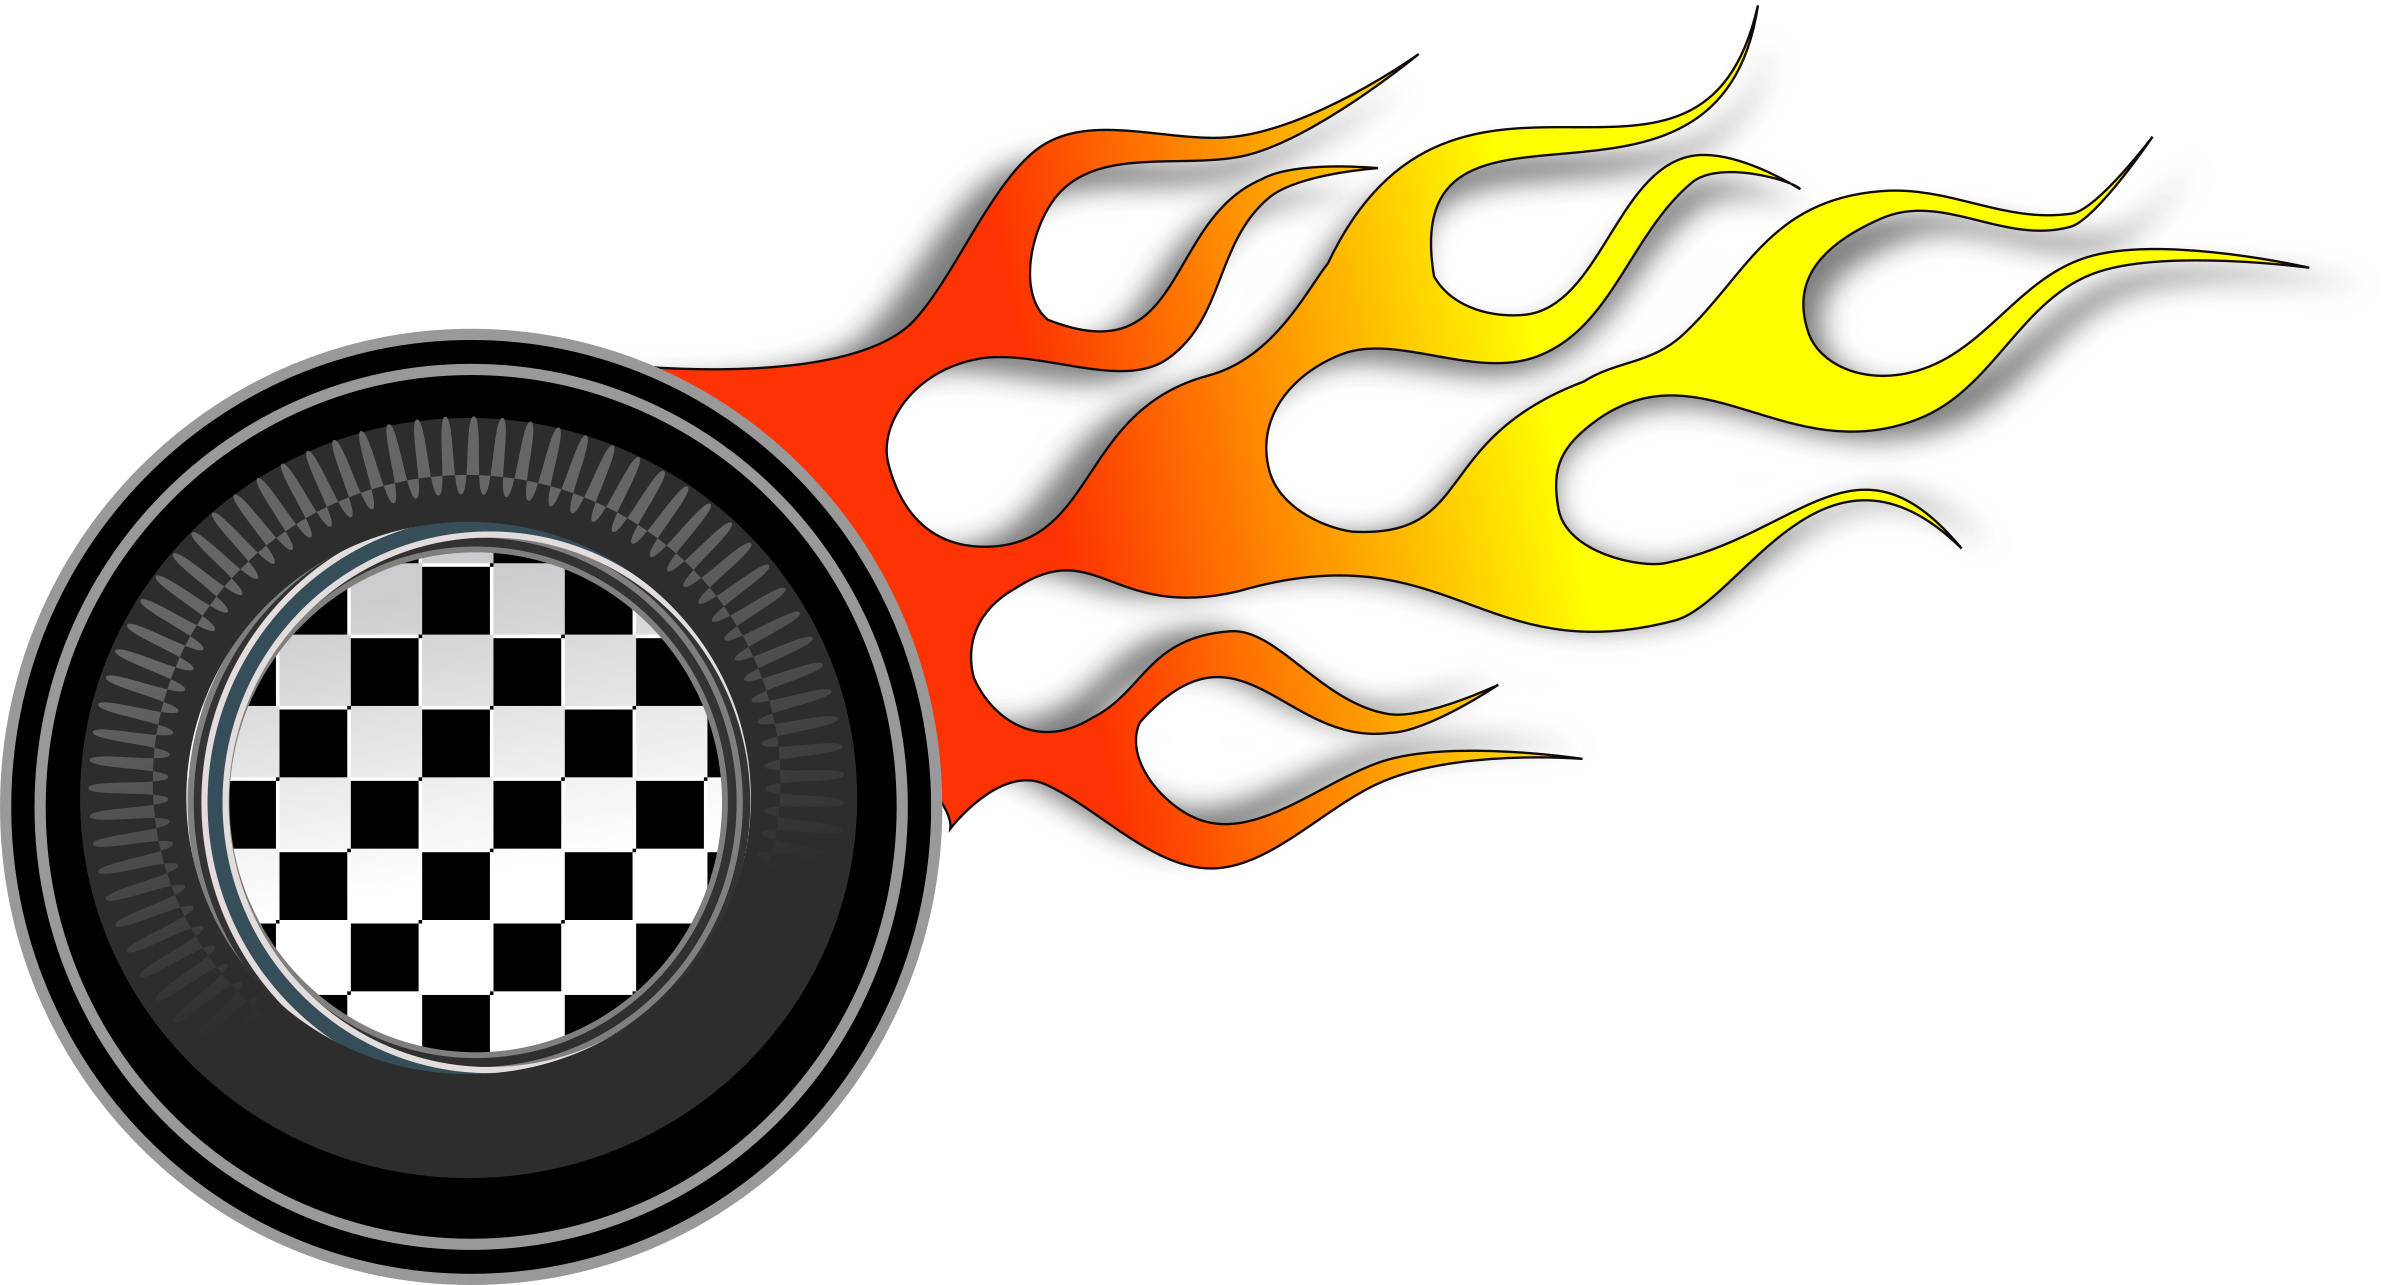 image library stock Wheel big image png. Racing clipart motorsport